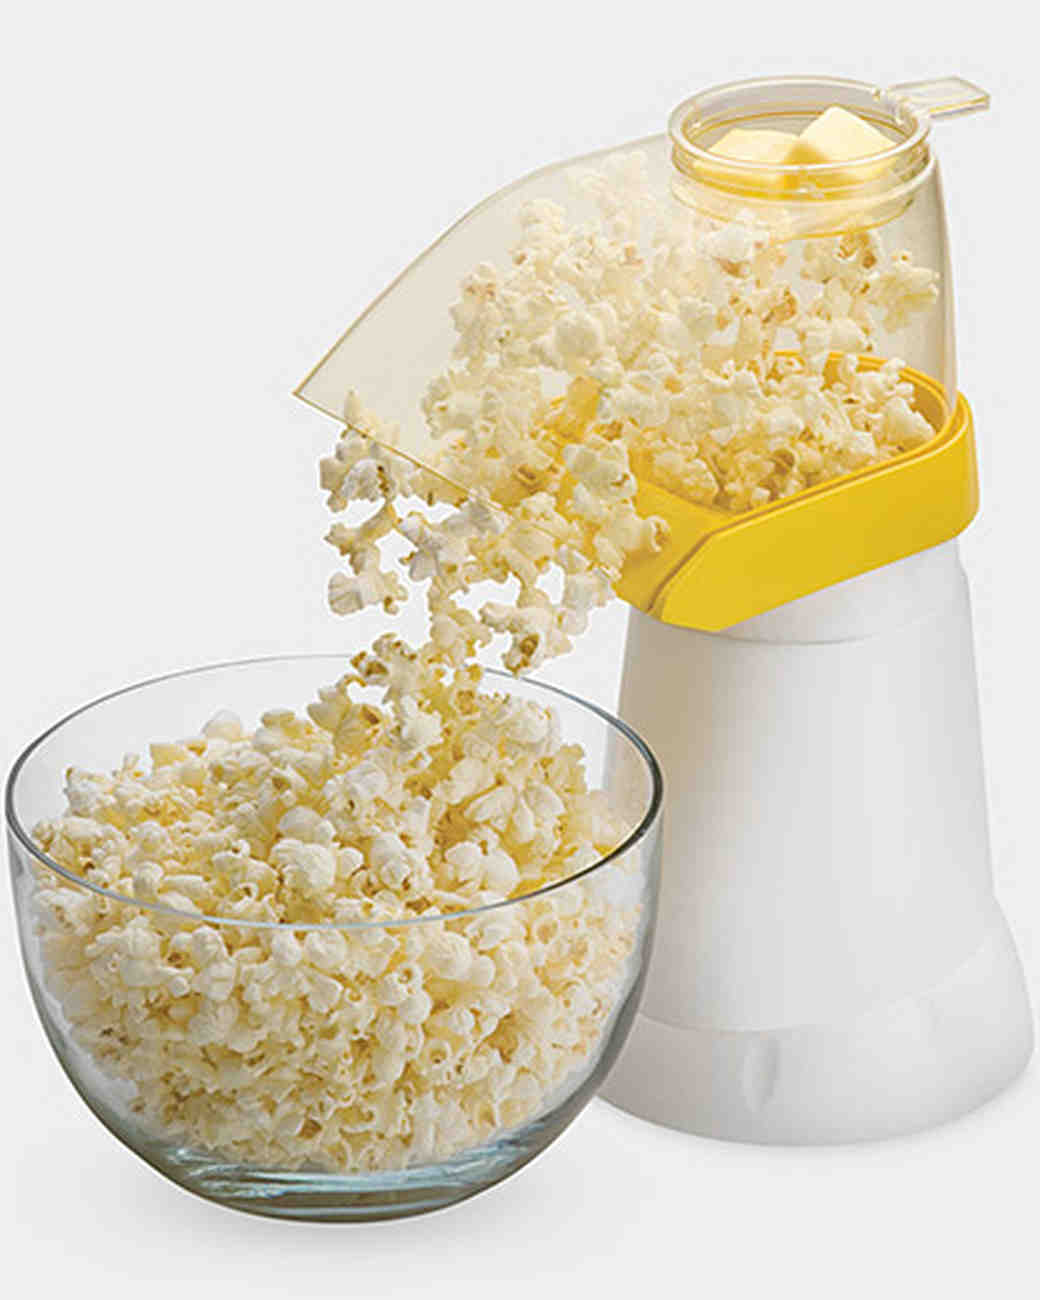 engagement-gifts-moma-store-popcorn-maker-0616.jpg